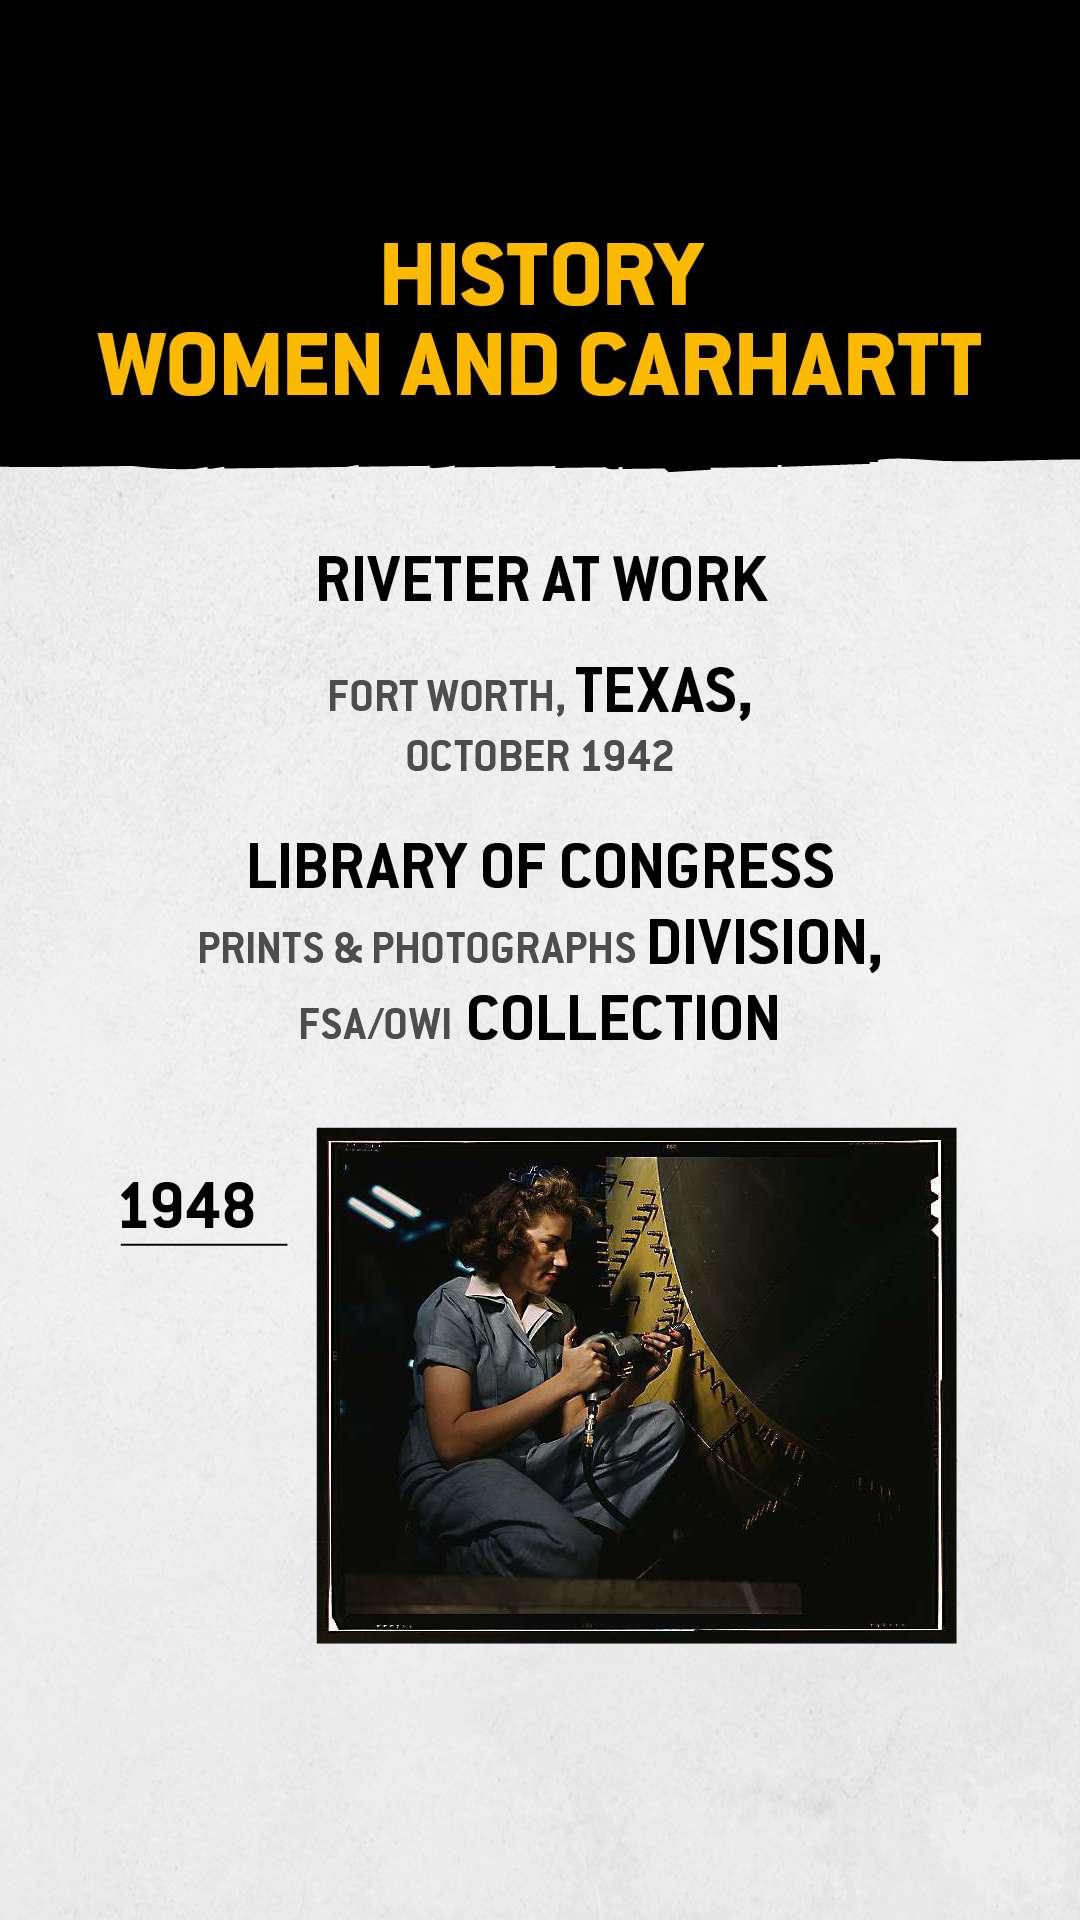 Klinker aan het werk, Fort Worth, Texas, oktober 1942 (Library of Congress, Prints & Photographs Division, FSA / OWI Collection)